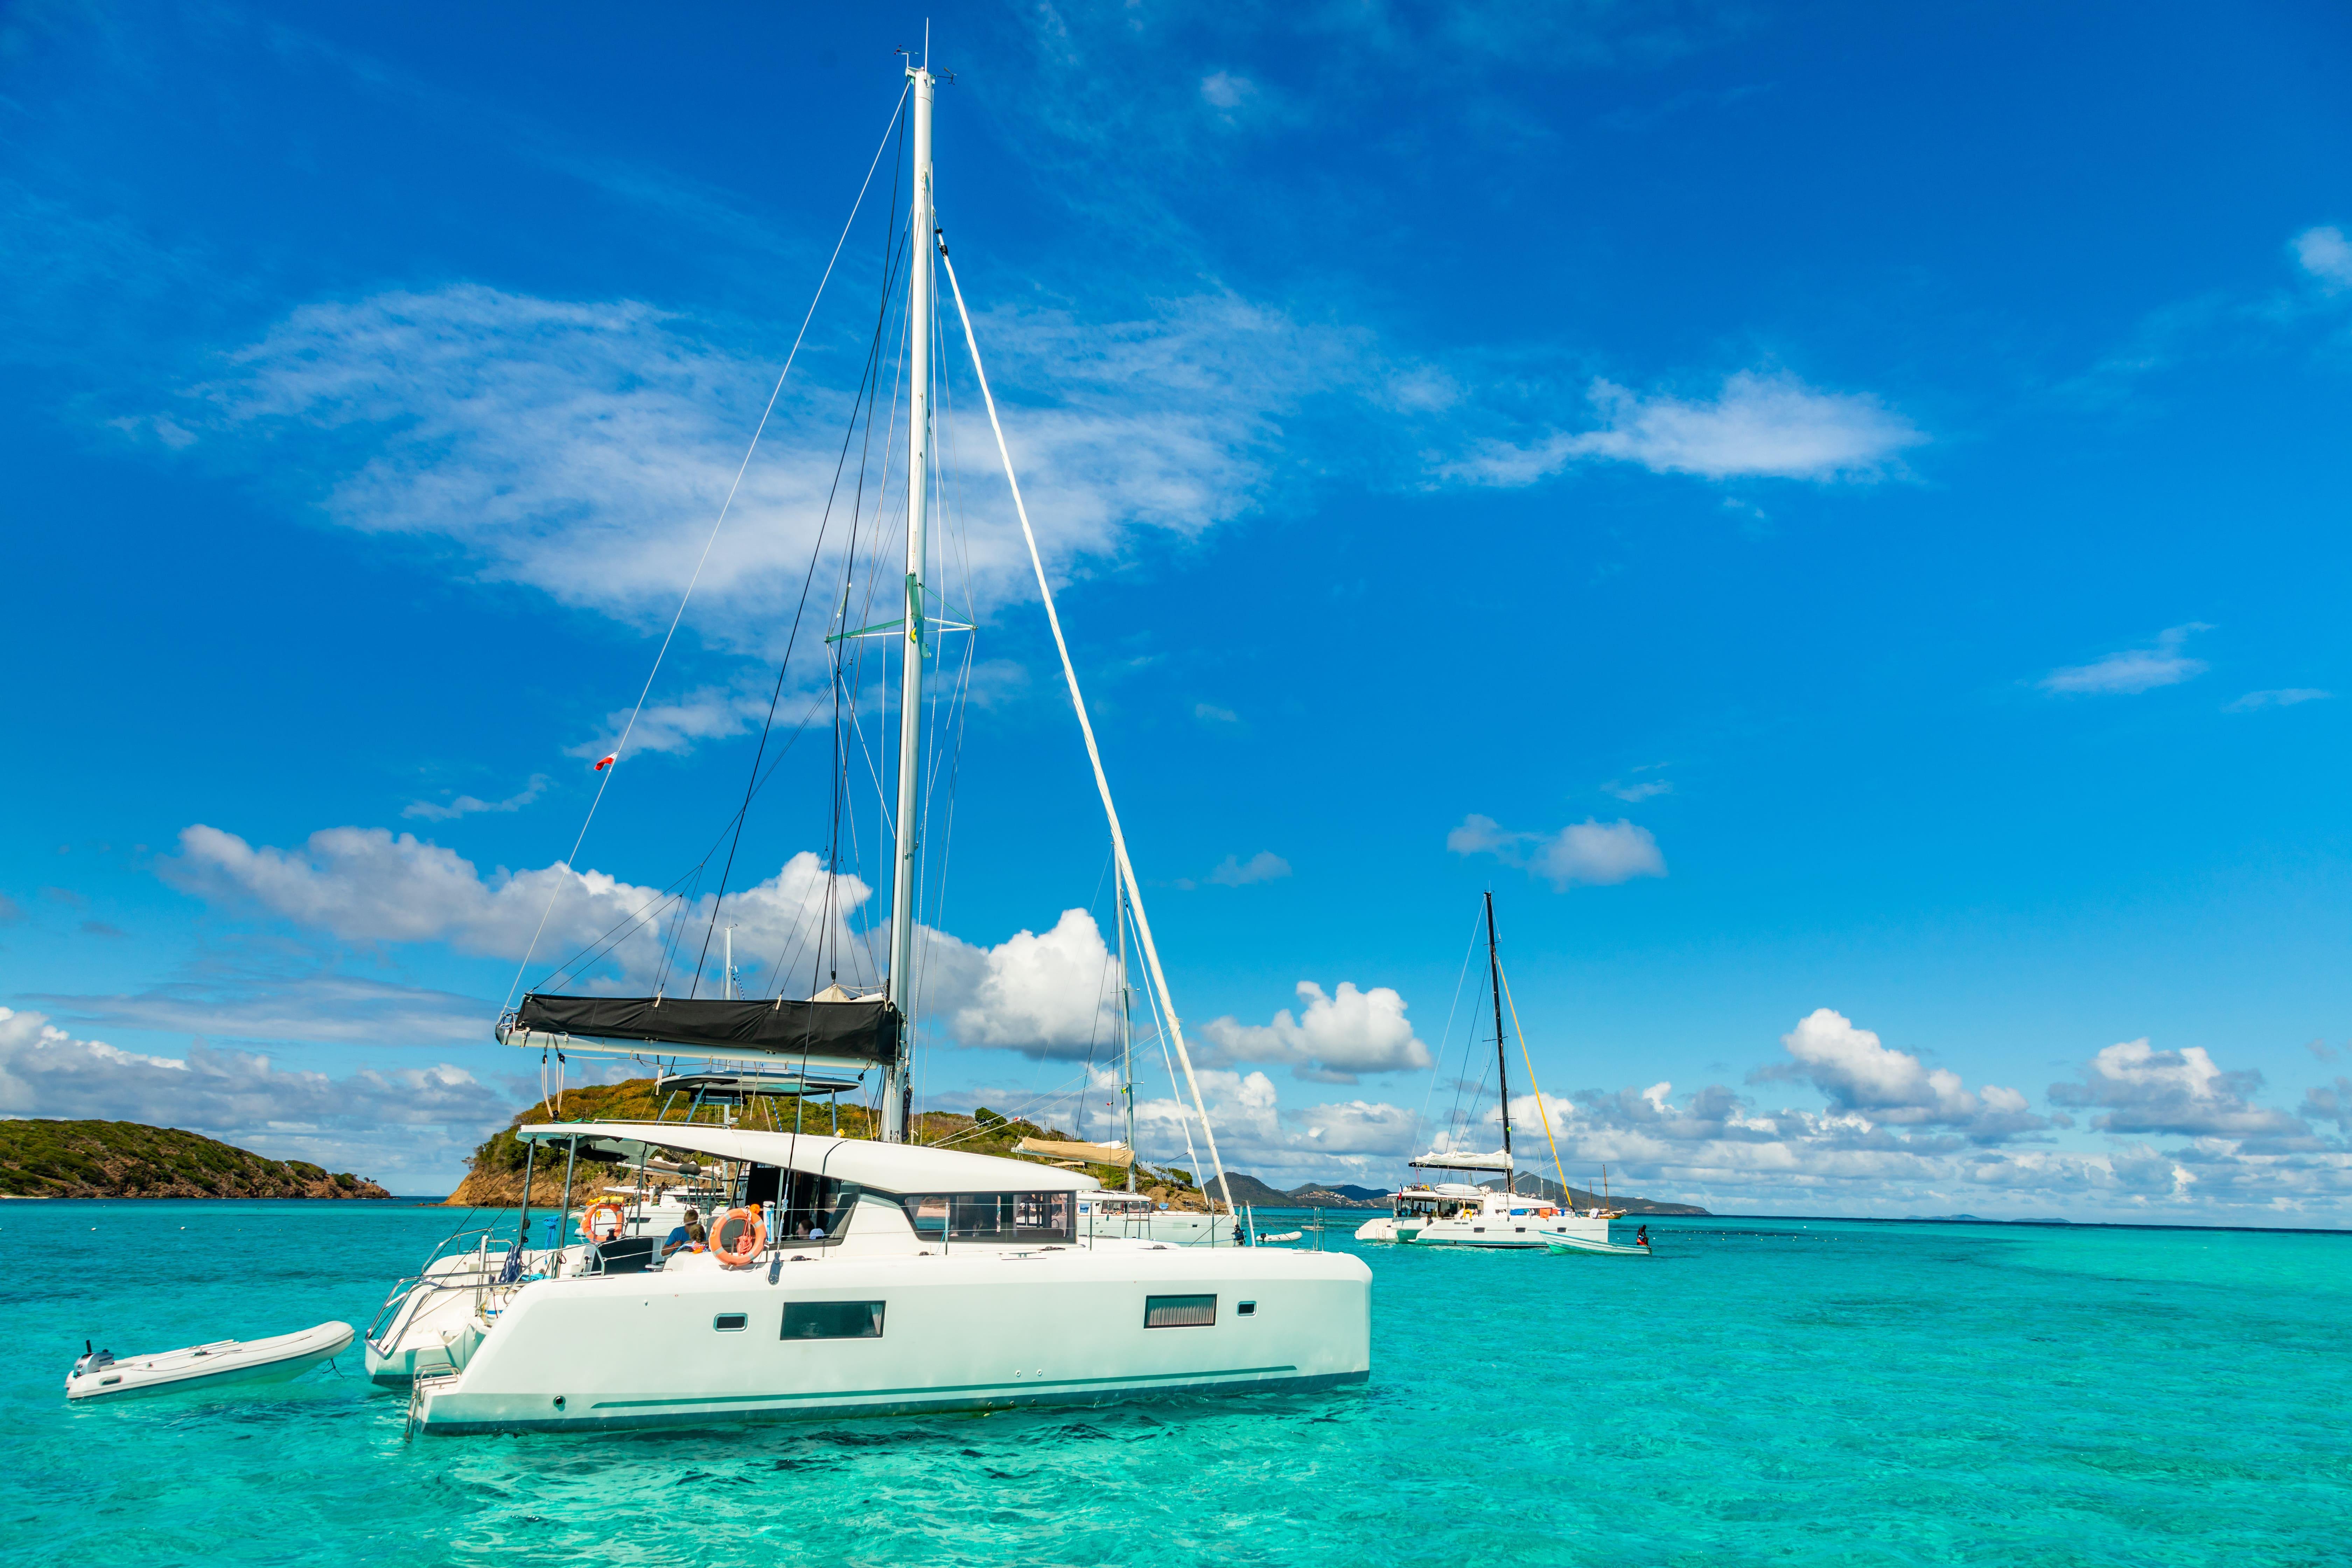 USVI Catamaran Charter with Captain